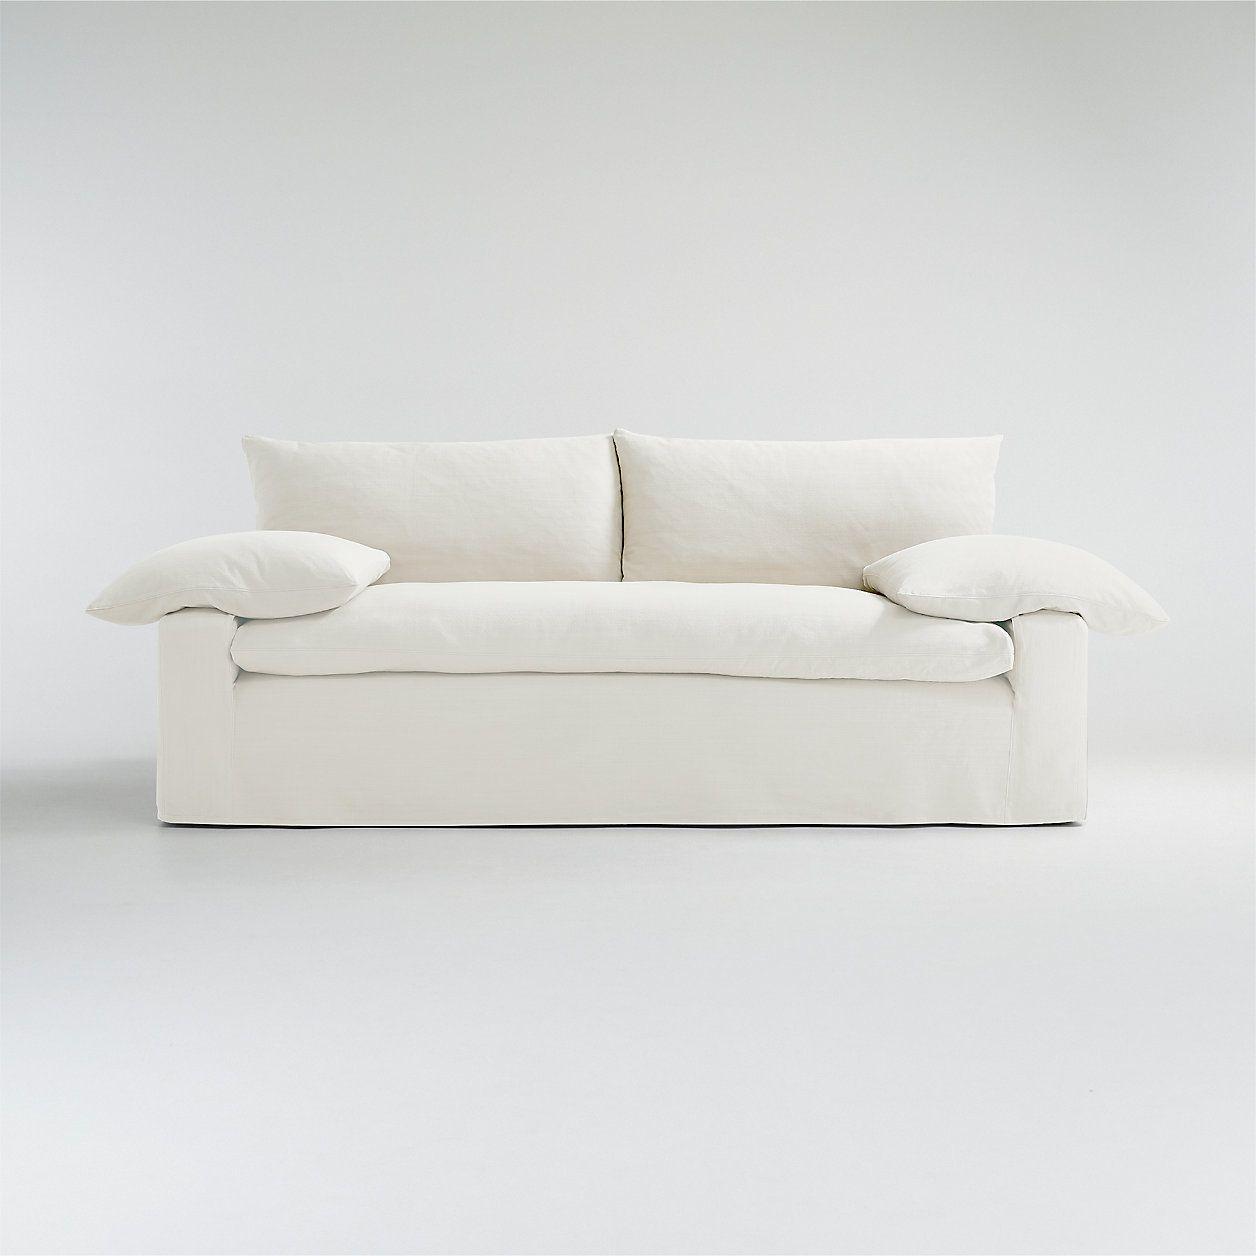 Crate&Barrel Ever Slipcovered Sofa